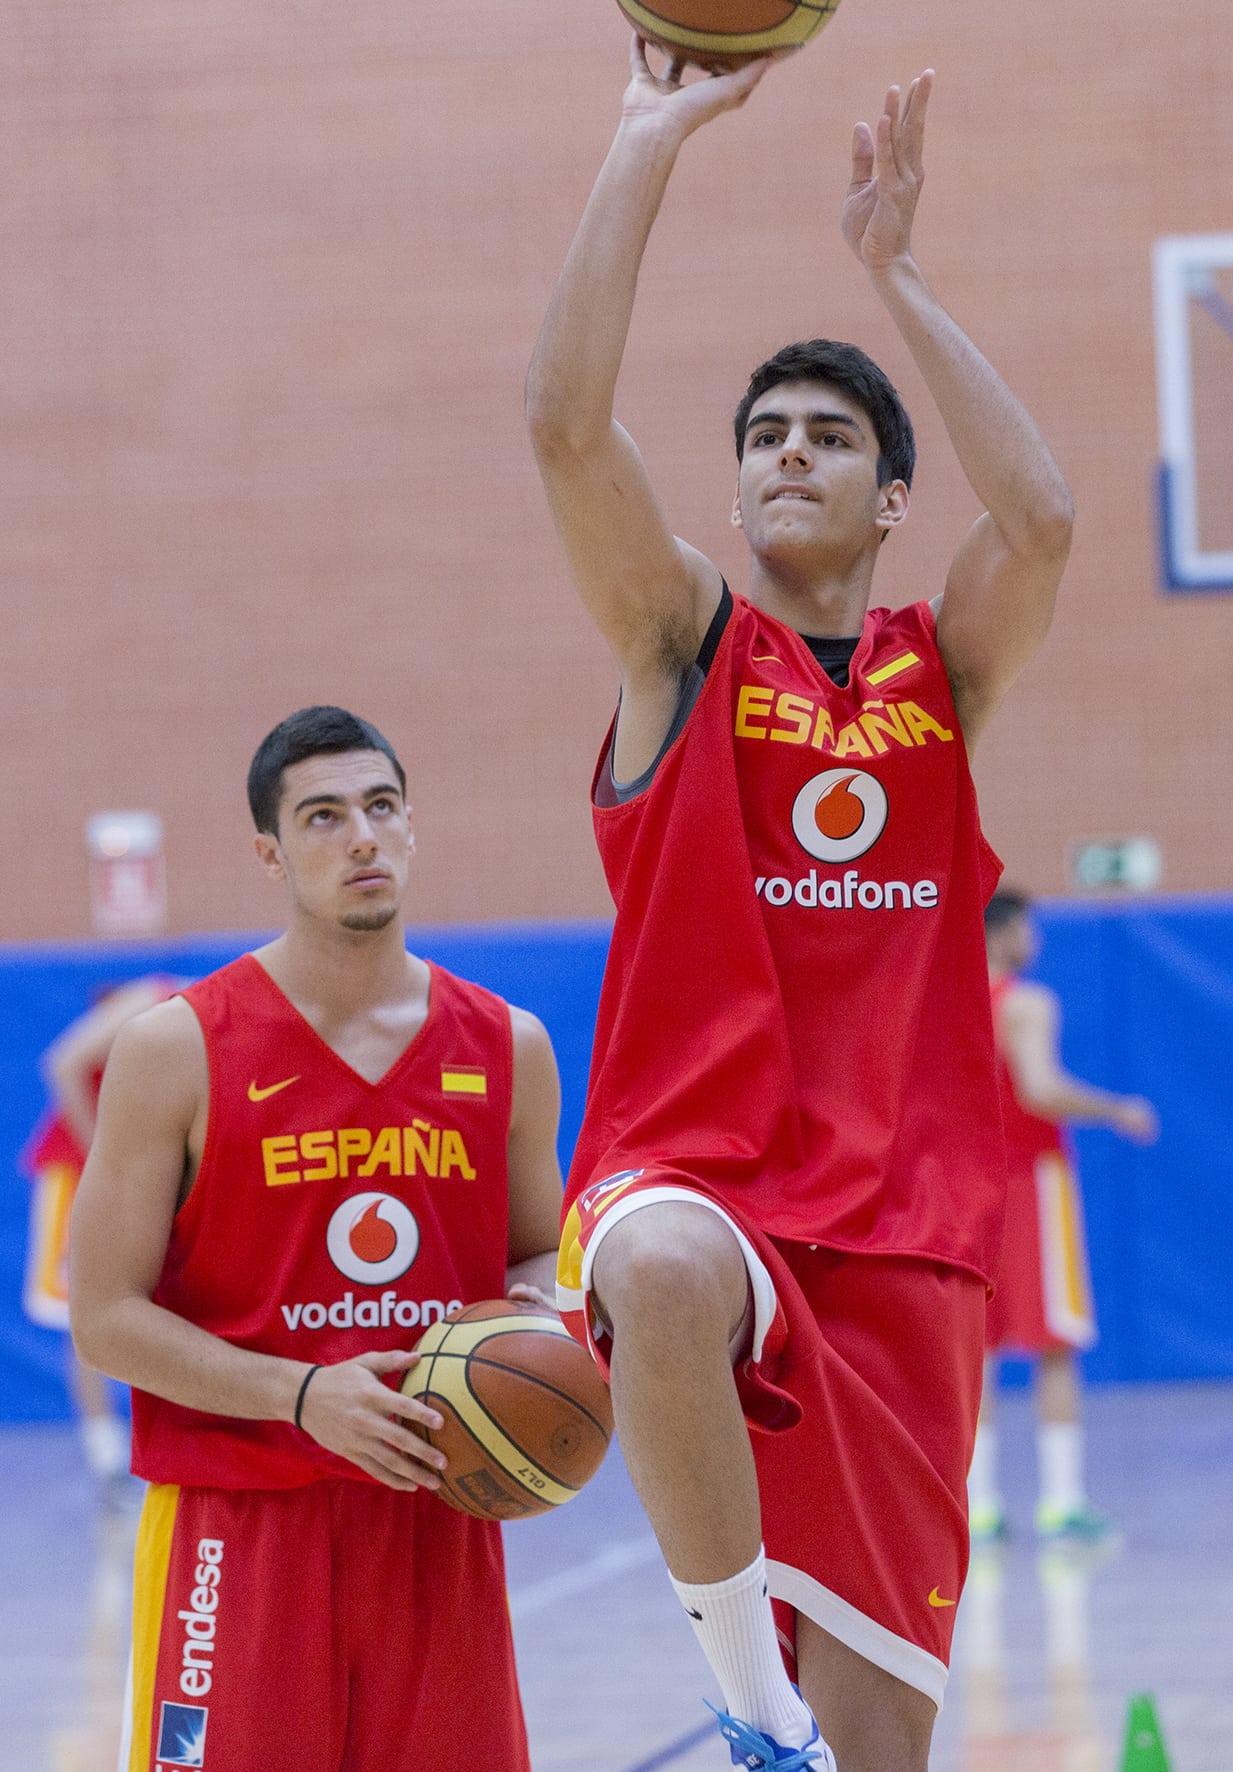 Segundo torneo para Jacobo Díaz con la selección U18, ahora en Logroño